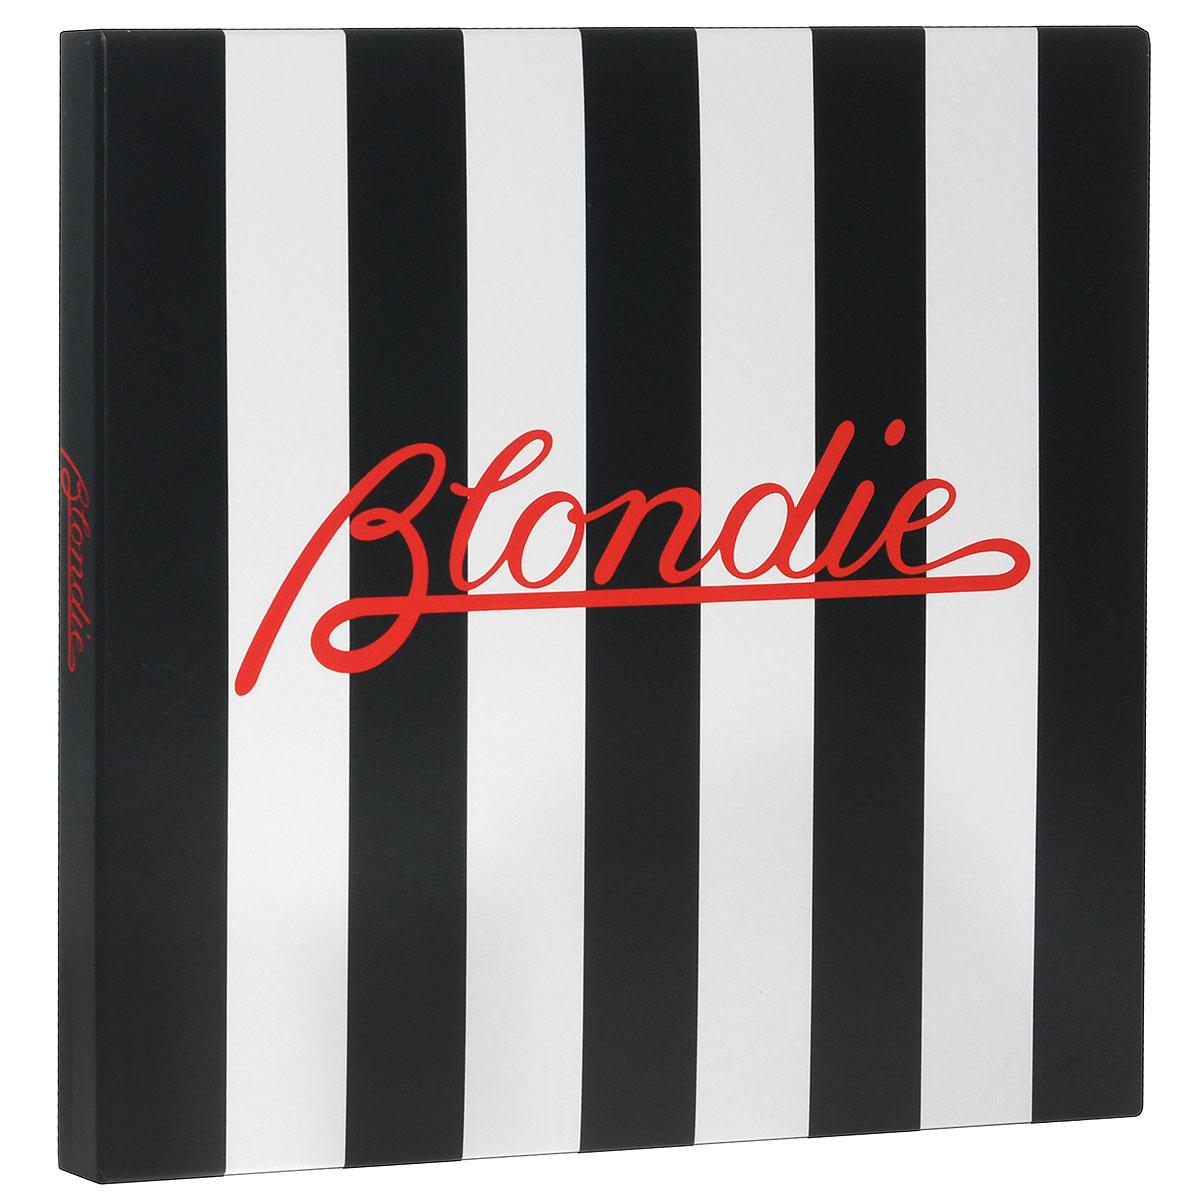 Blondie Blondie. Blondie (6 LP) blondie blondie blondie 6 lp